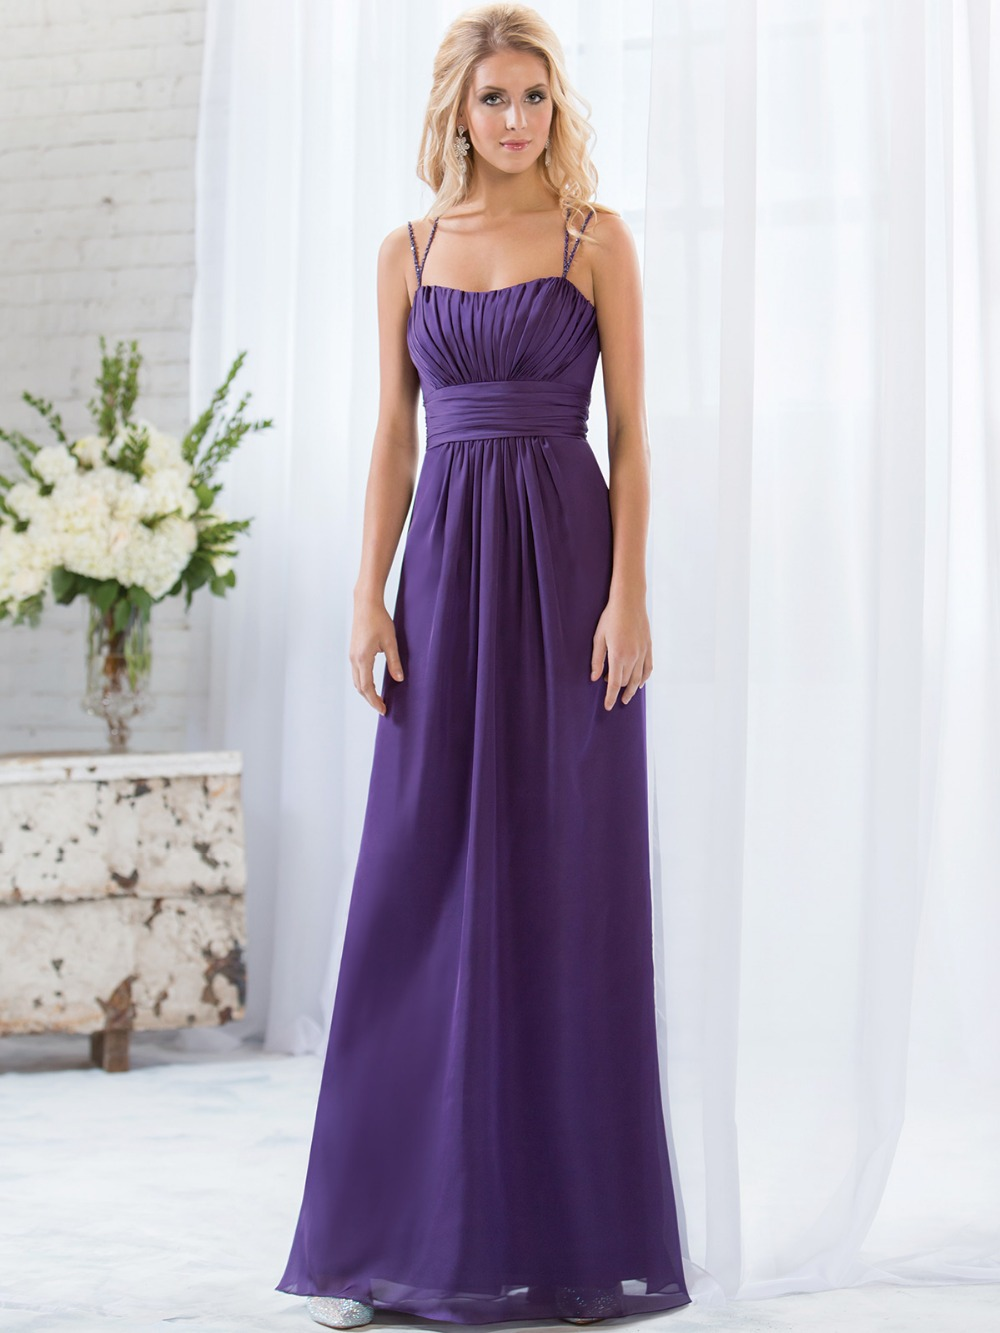 Purple plus size bridesmaid dresses vosoi compare prices on purple girls bridesmaids dress online shopping ombrellifo Gallery